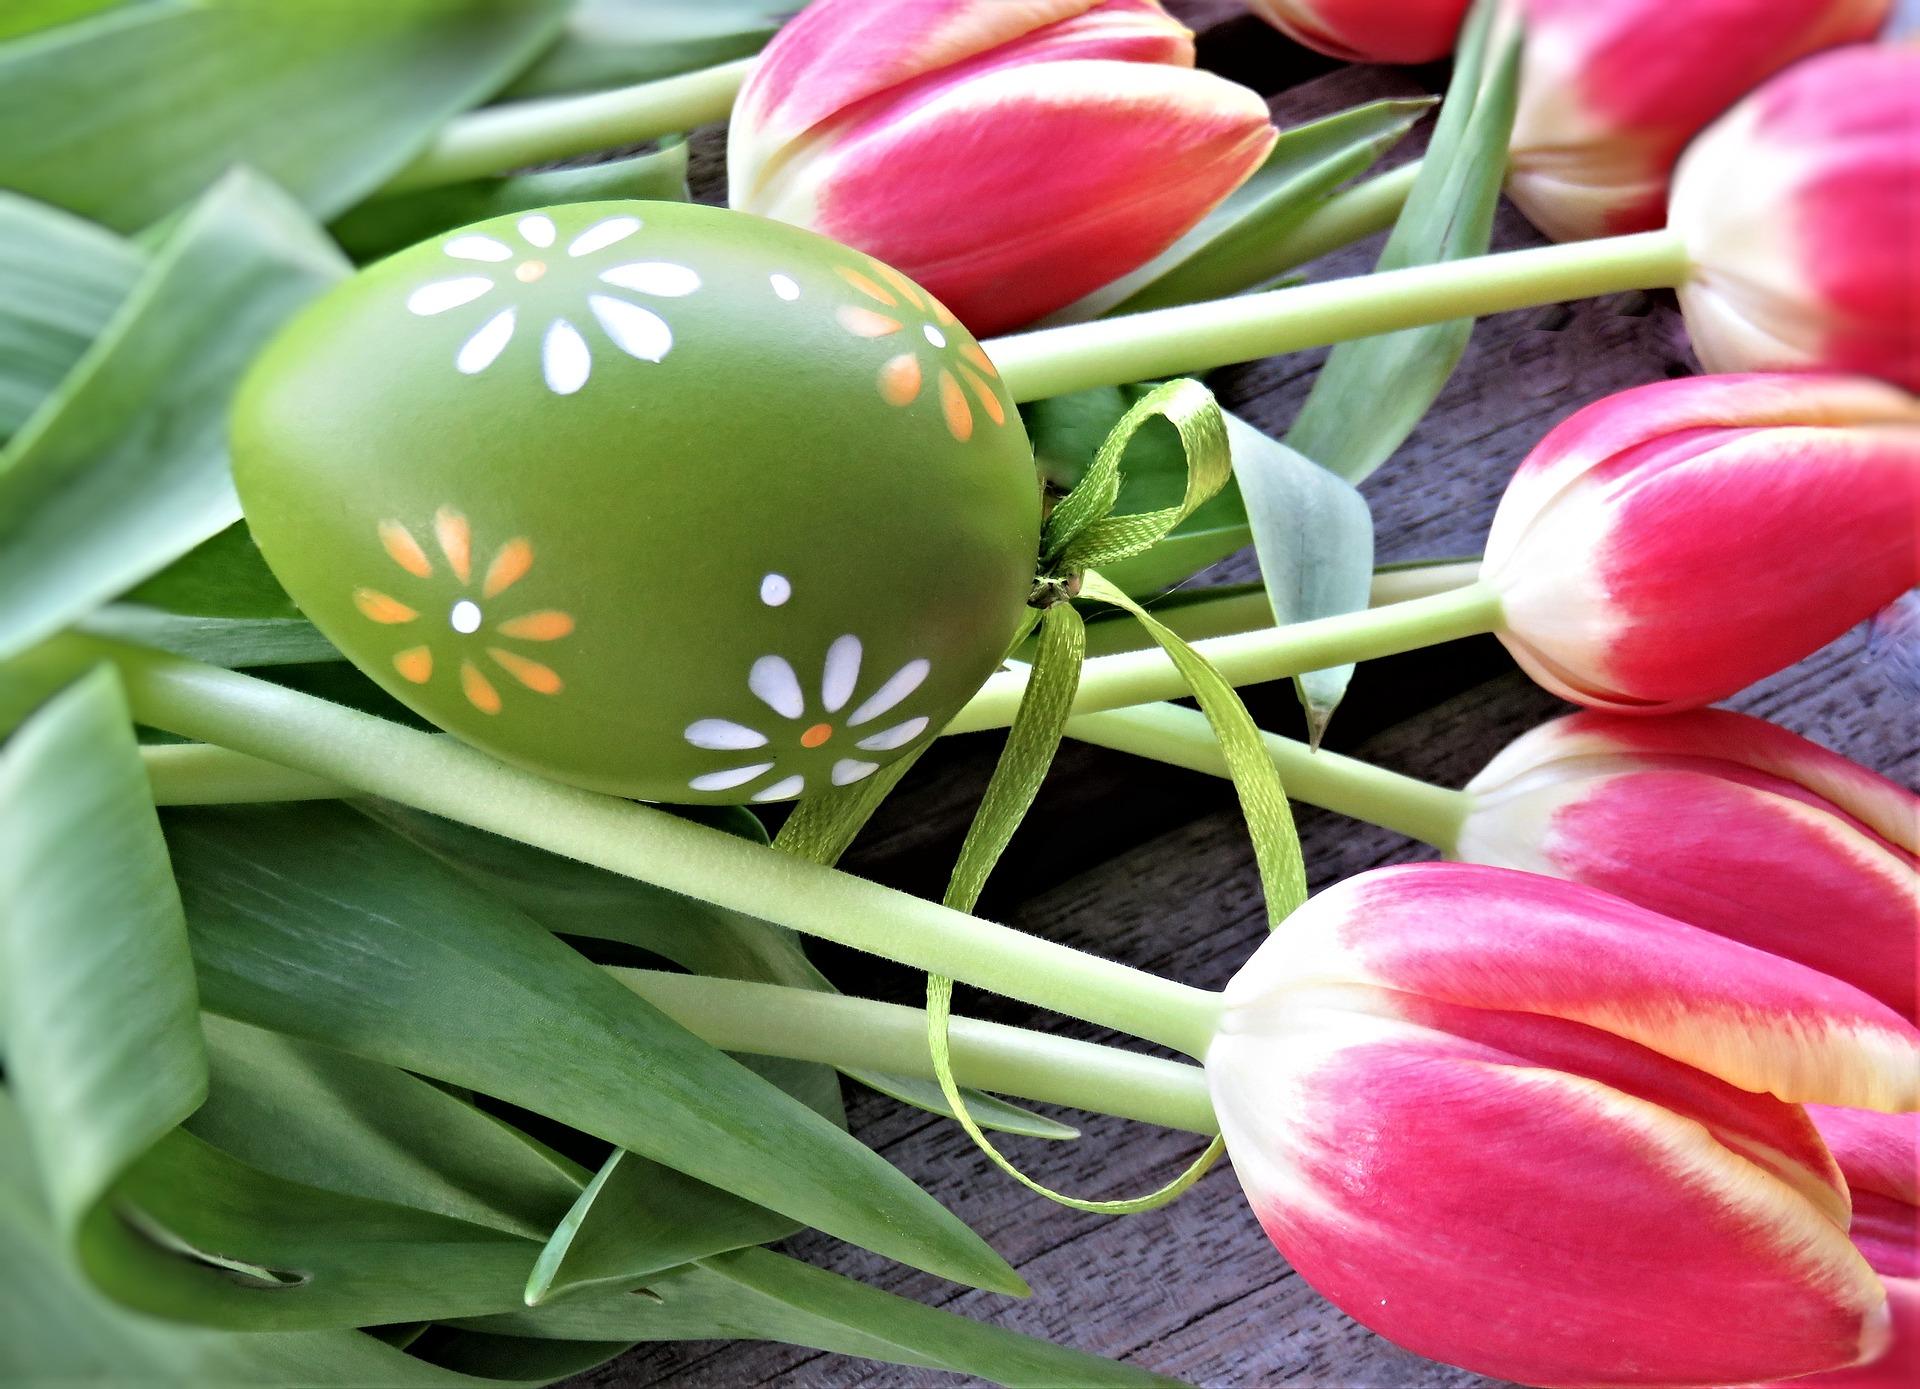 tulips-4103299_1920.jpg